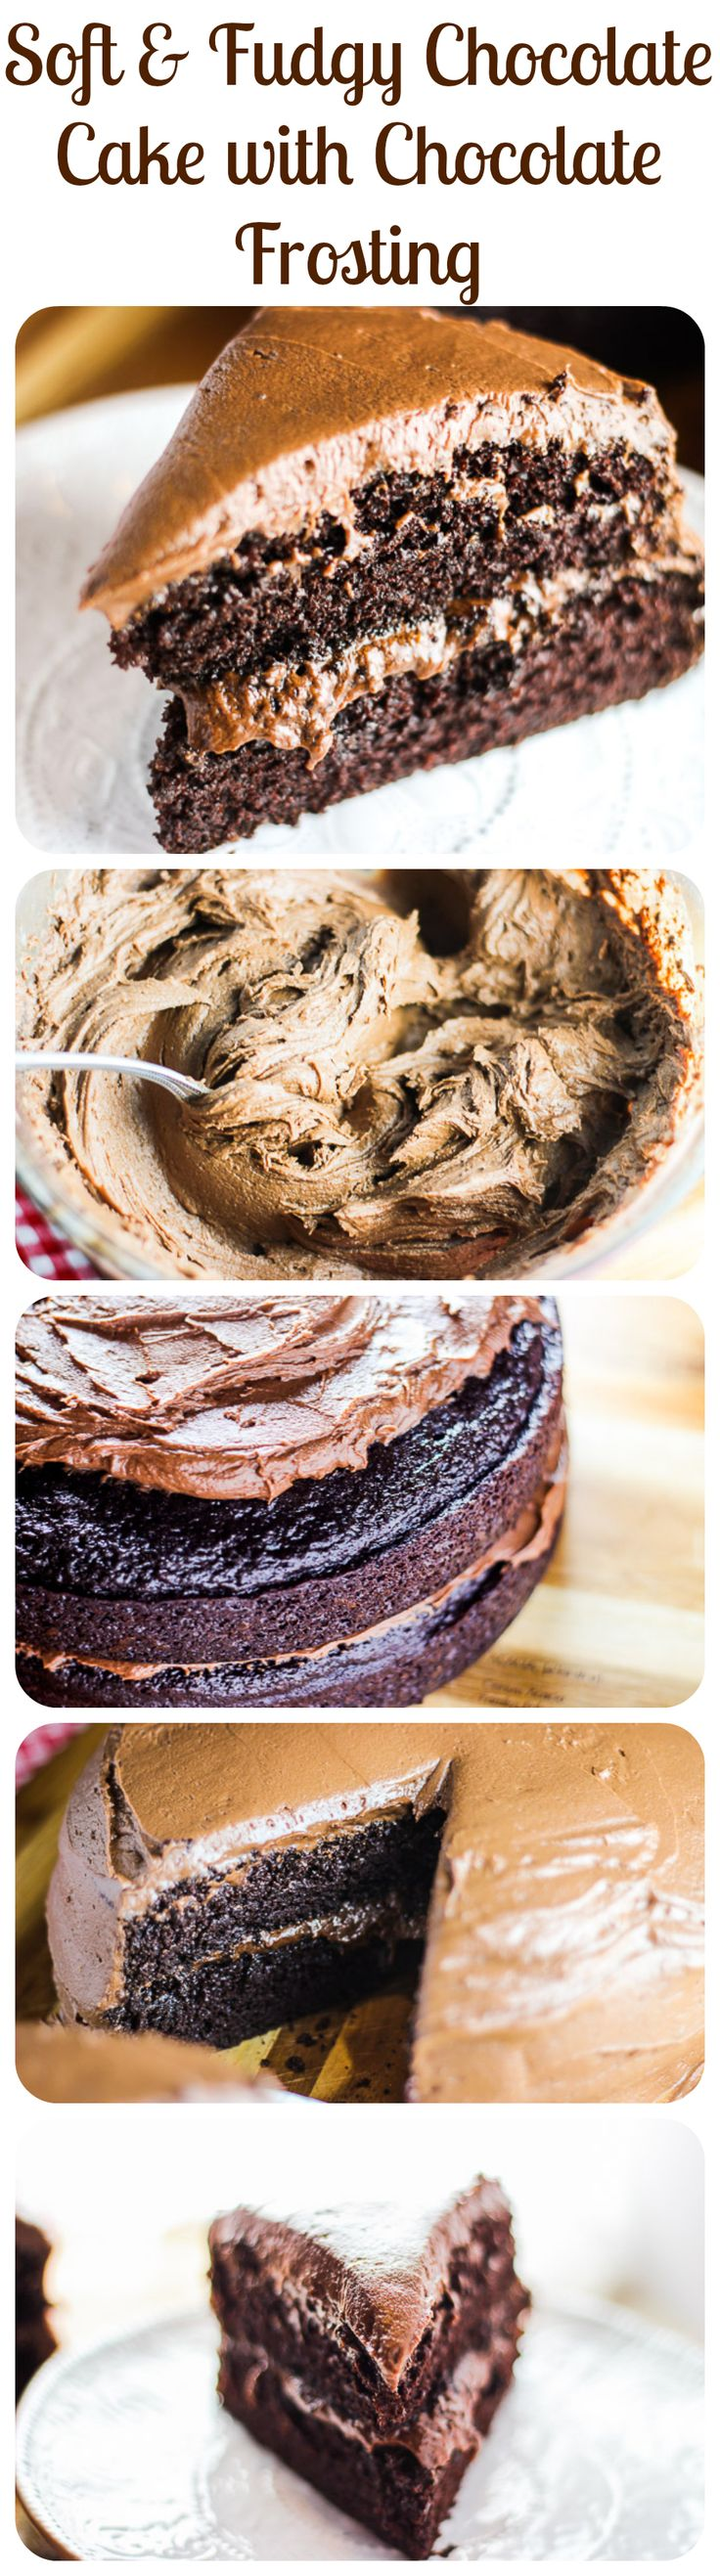 Best 25+ Best chocolate cake ideas on Pinterest | Perfect ...